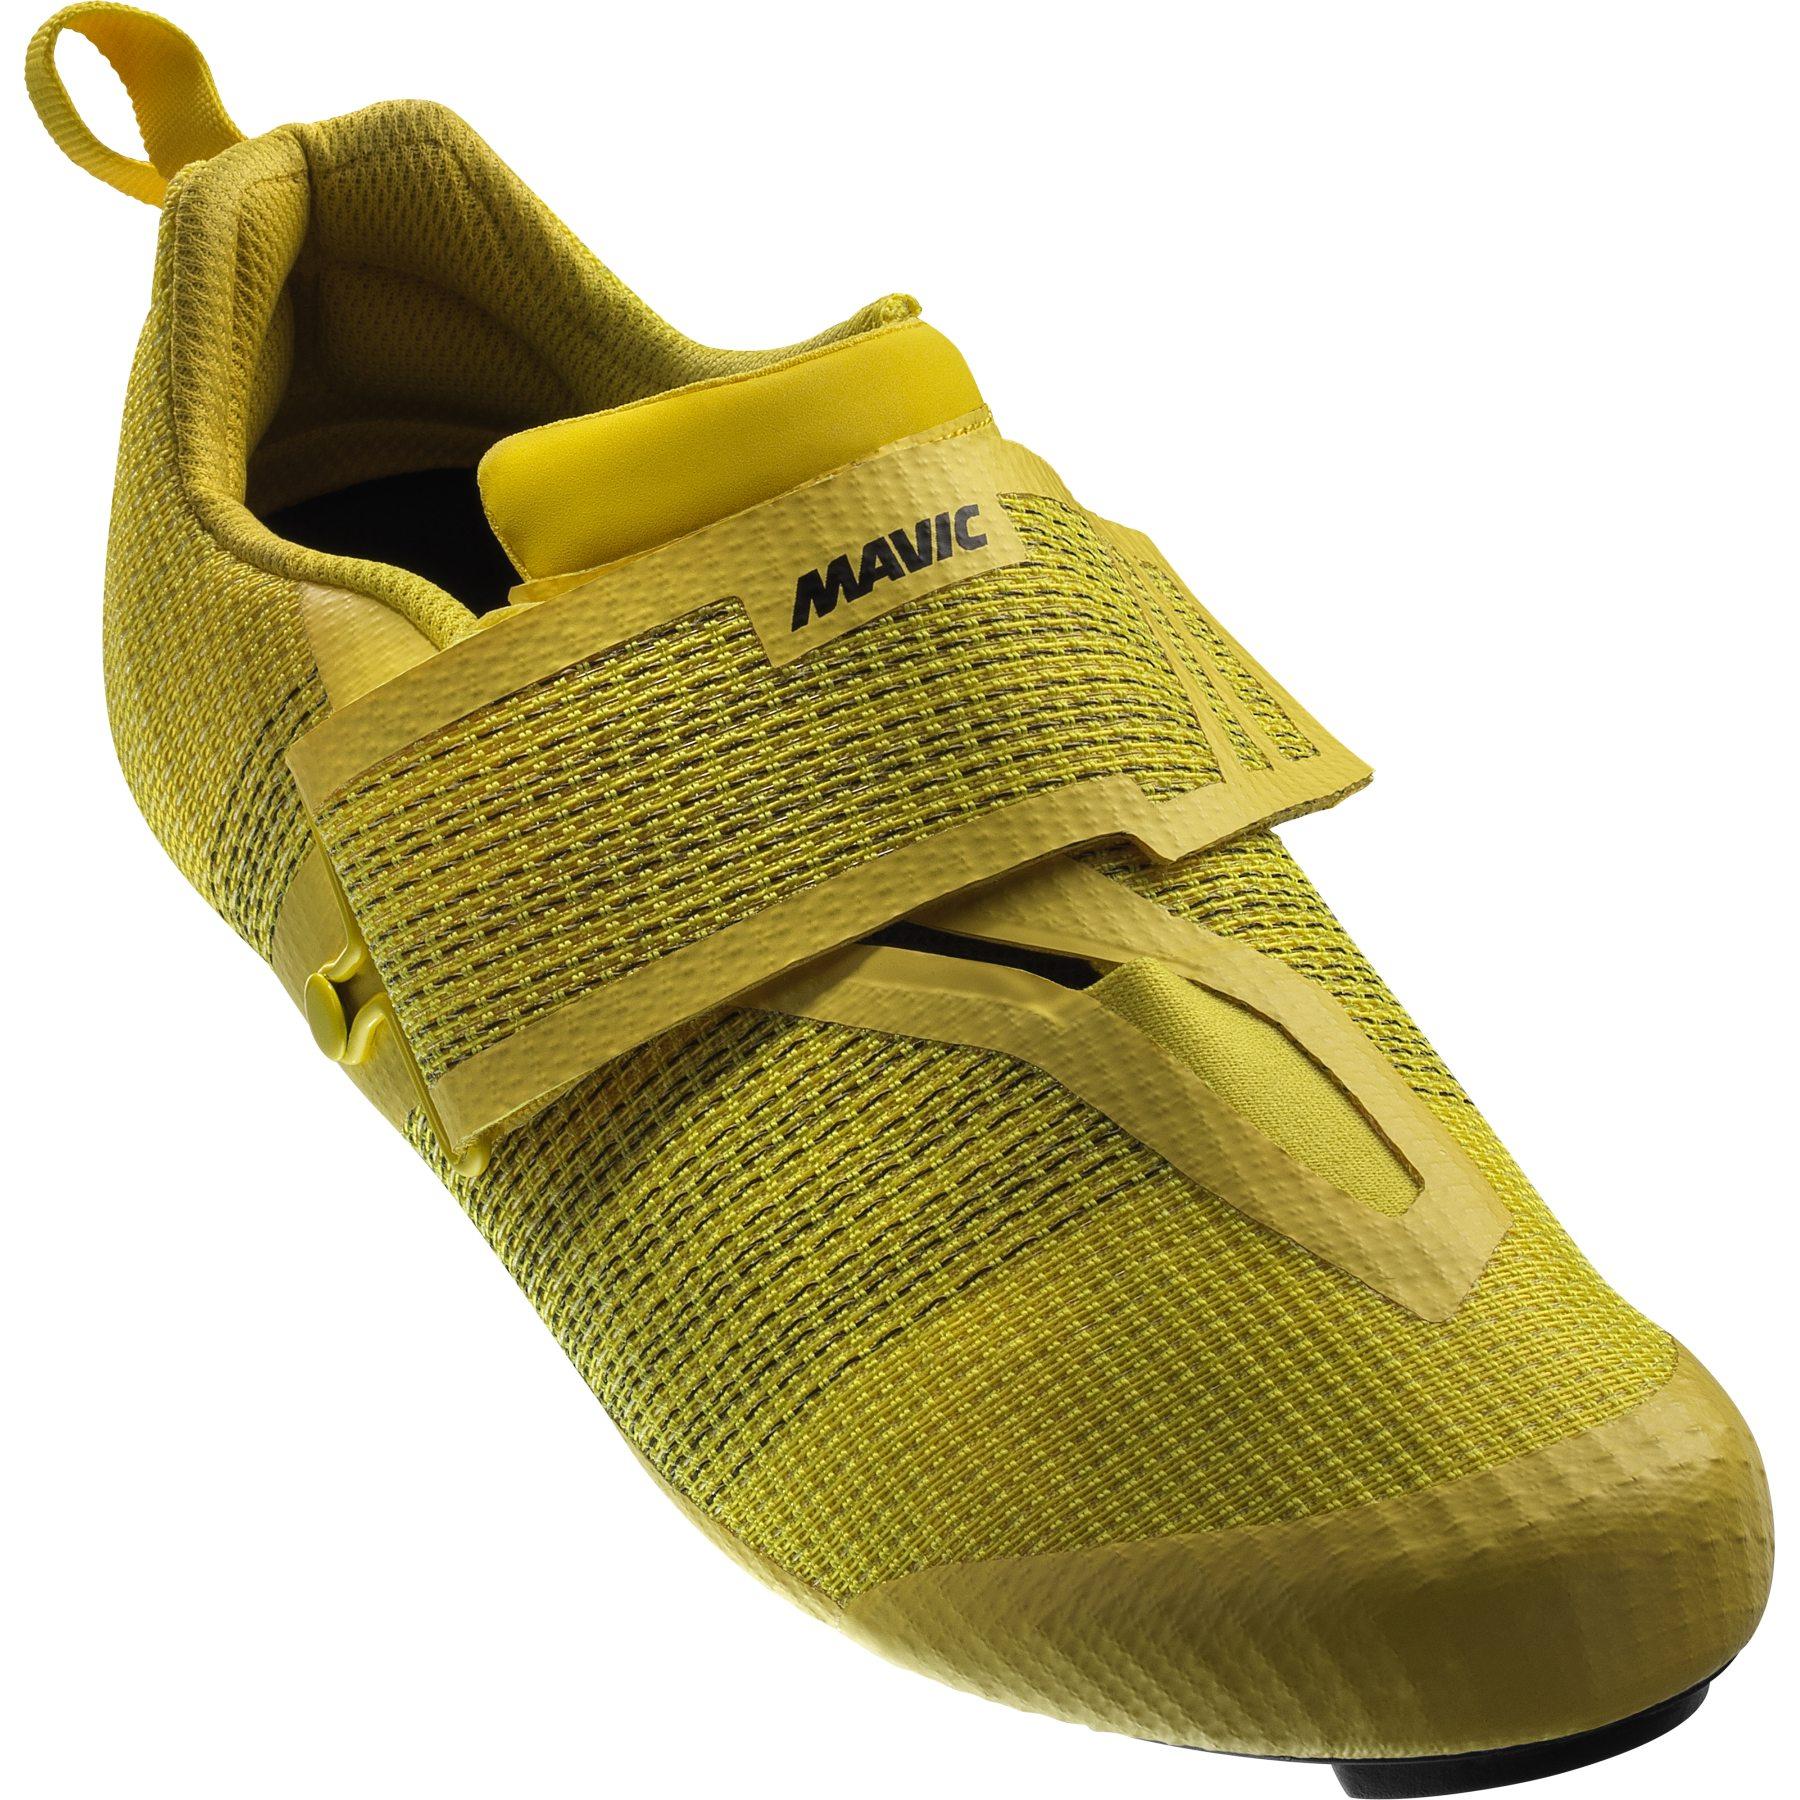 Produktbild von Mavic Ultimate Tri Triathlon Schuhe - yellow mavic/yellow mavic/black